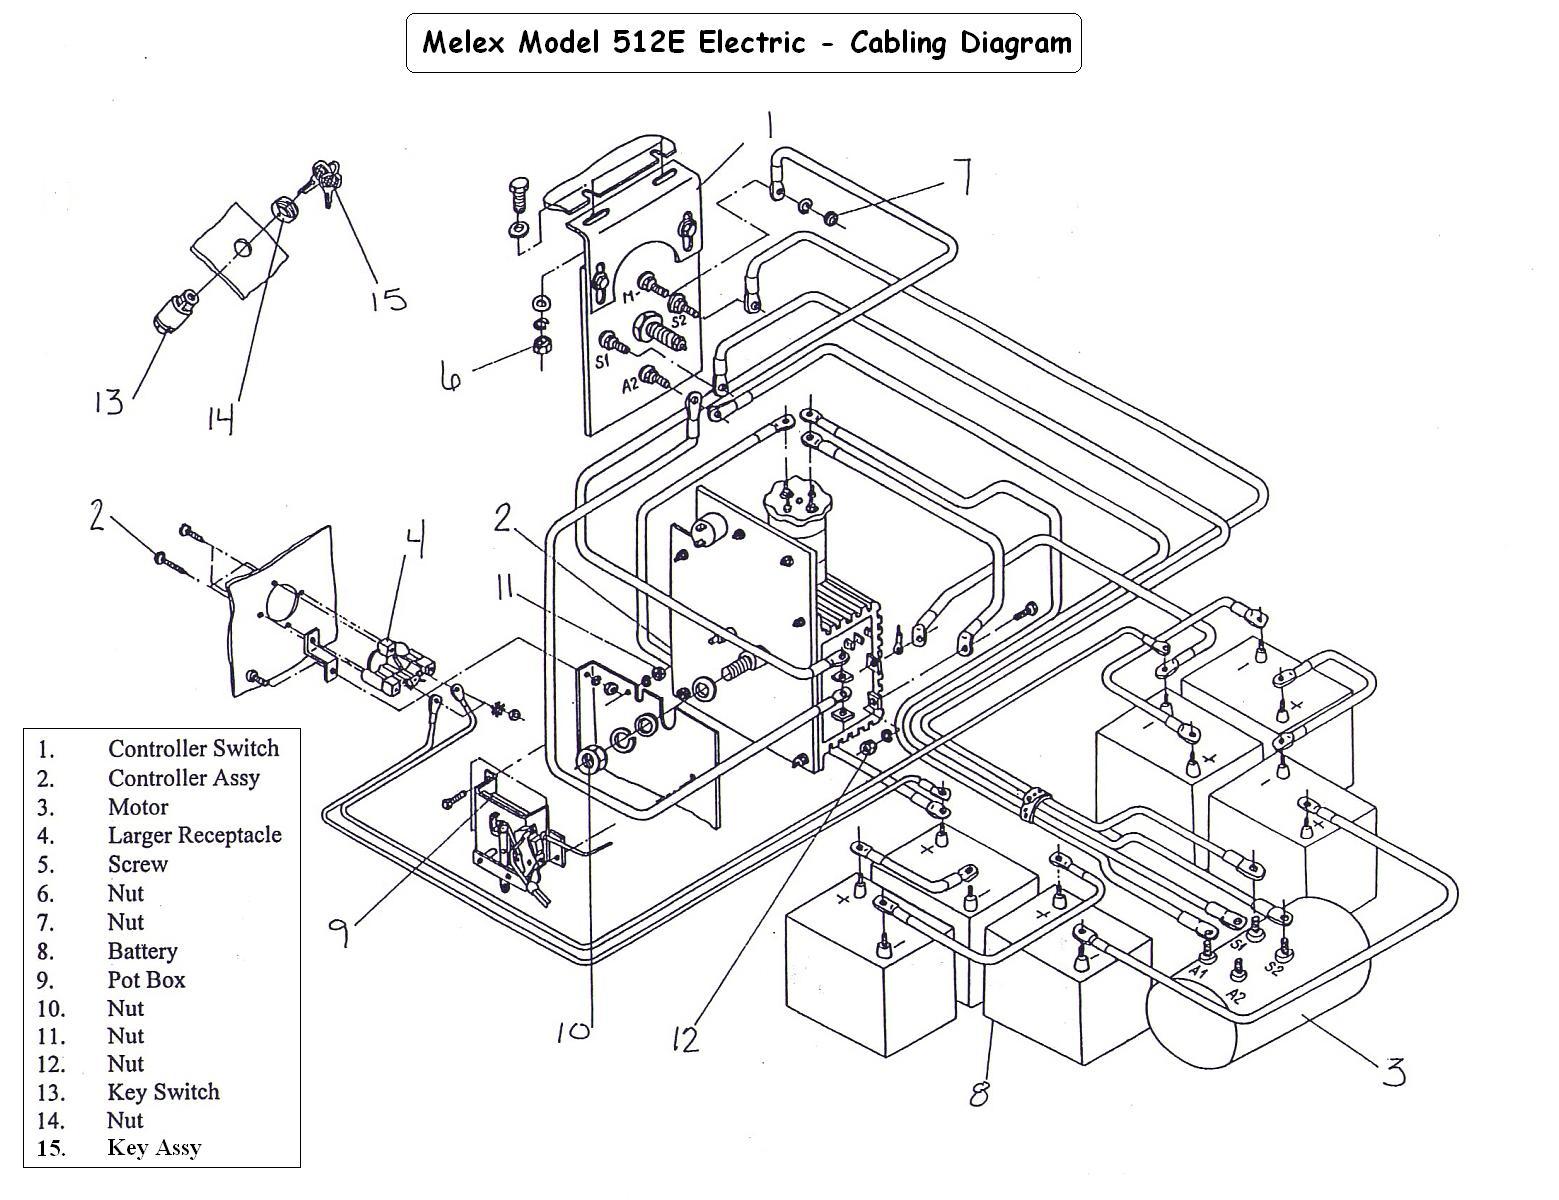 wiring diagram for melex 512 golf cart read all wiring diagram Melex 512 Service Manual